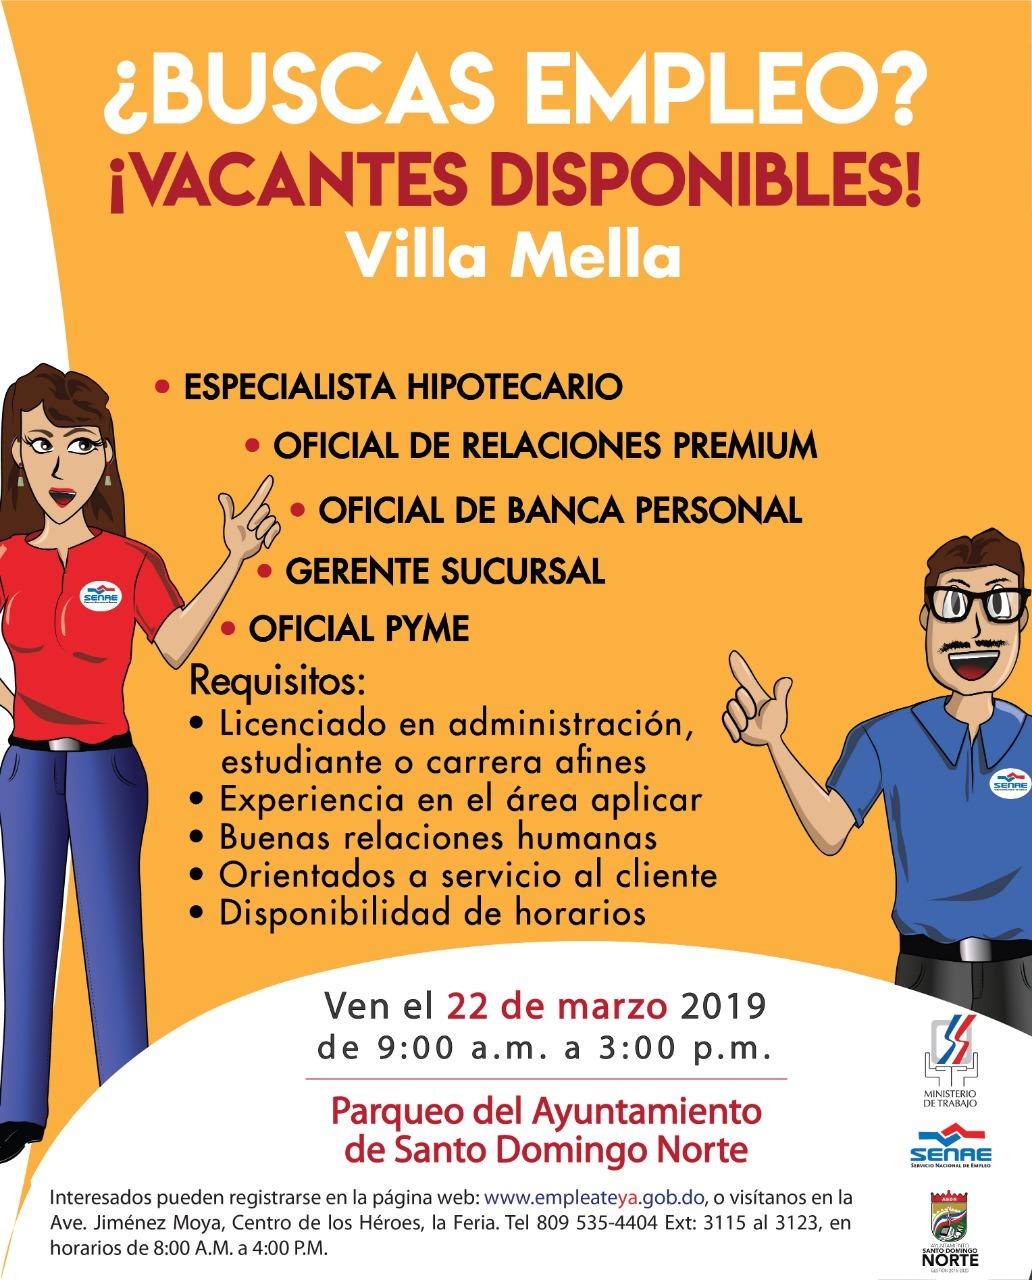 Feria de empleo 22 de marzo 2019